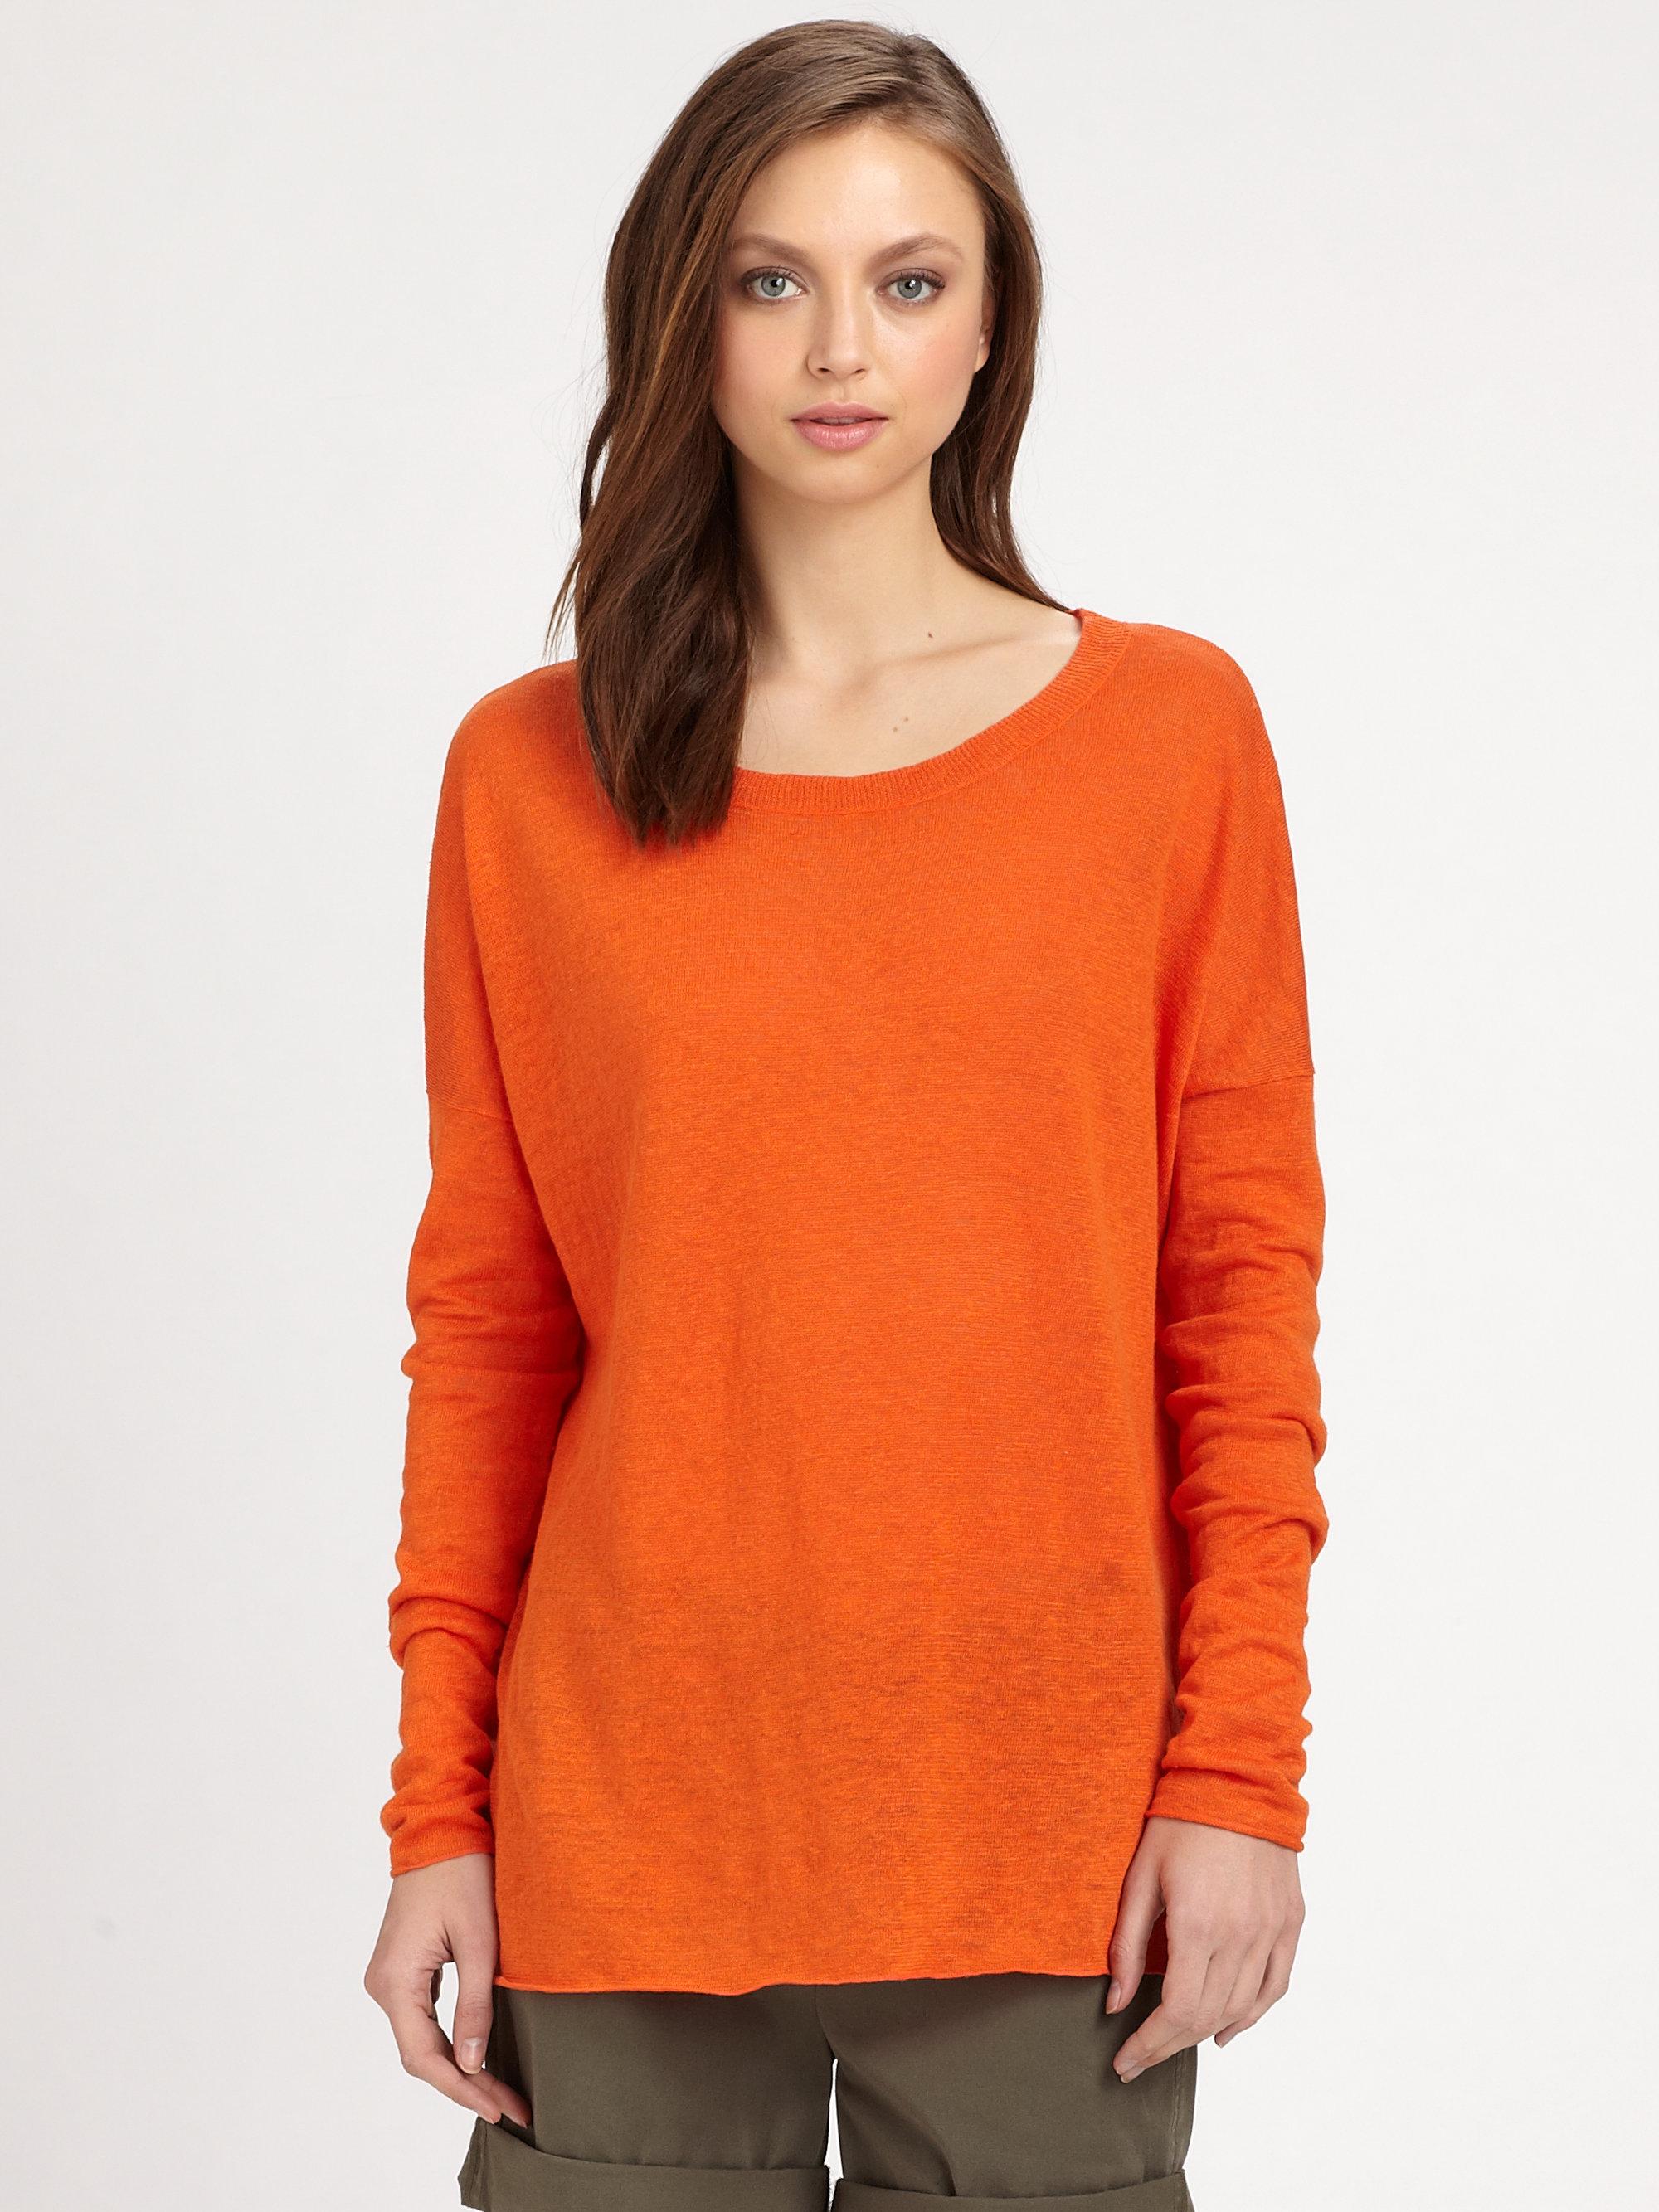 Vince Drop Shoulder Cotton Sweater in Orange   Lyst